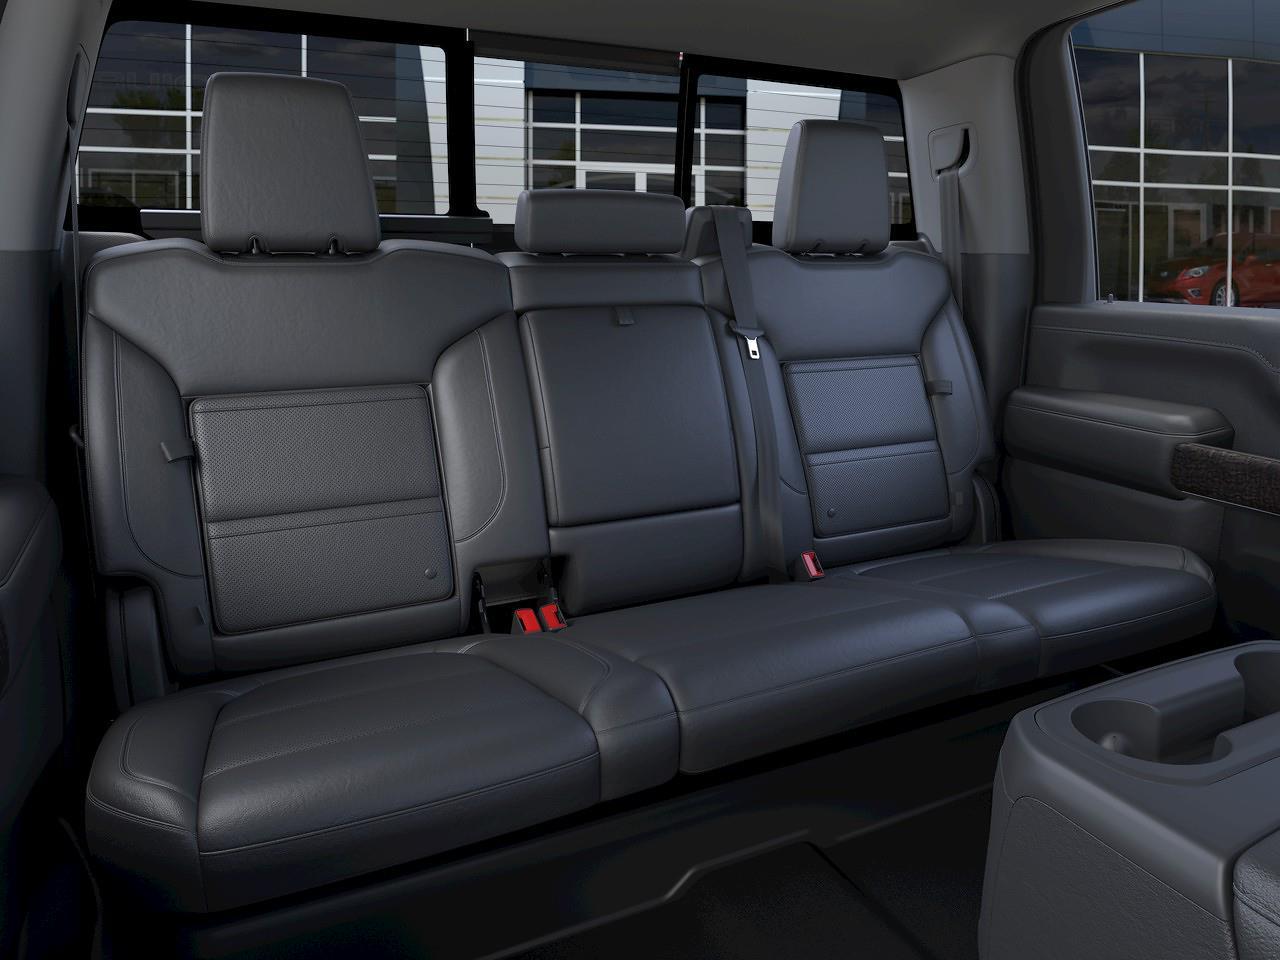 2021 GMC Sierra 3500 Crew Cab 4x4, Pickup #GM12147 - photo 14